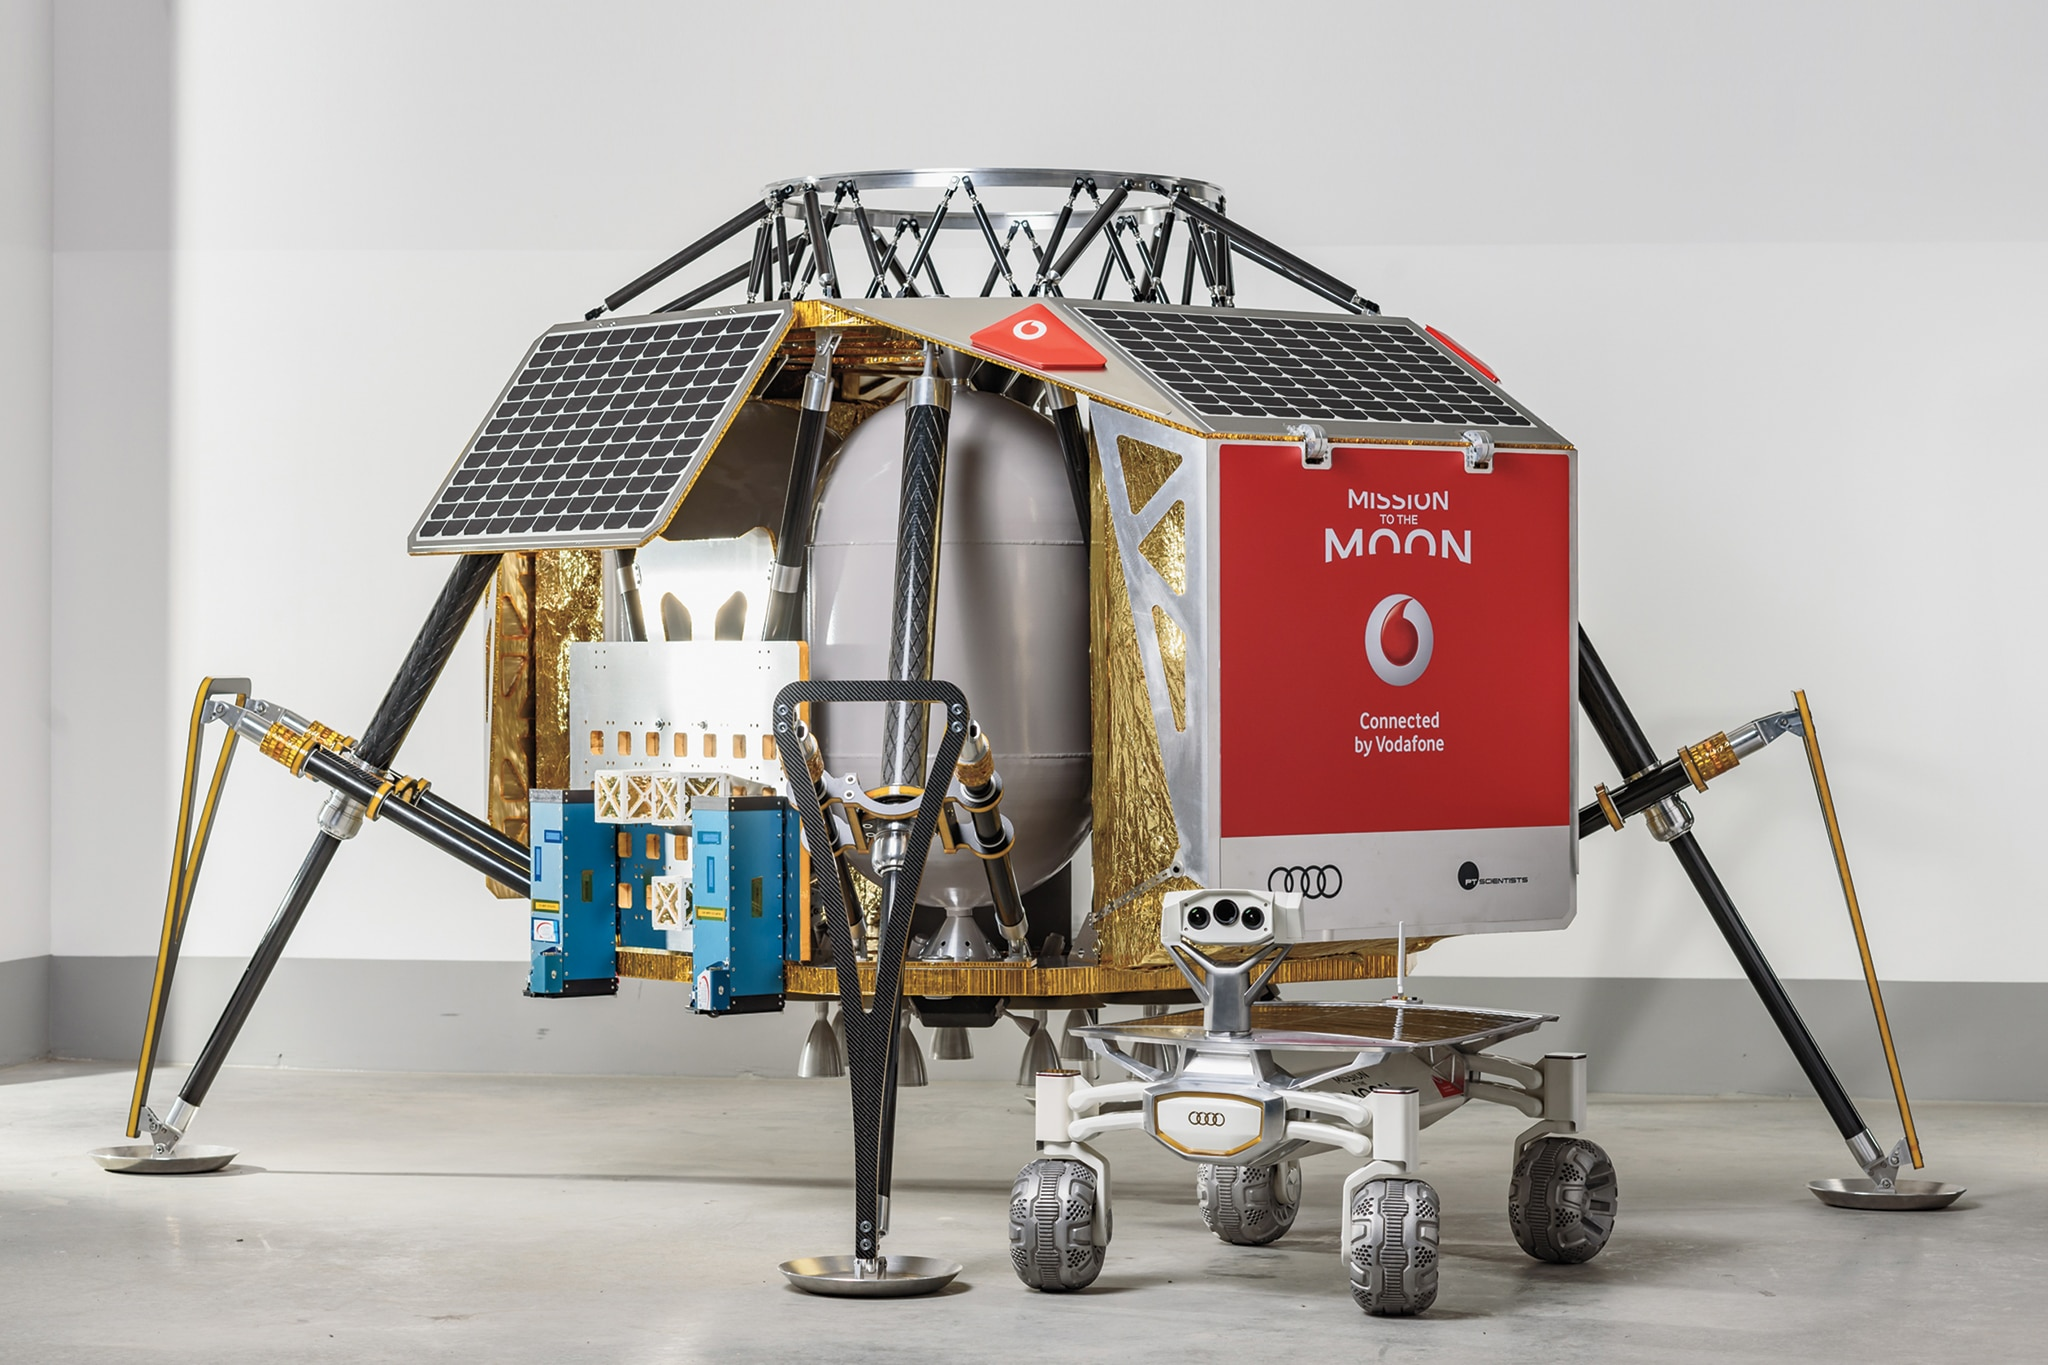 Build Your Honda >> Audi Prepares Its Lunar Quattro to Make a Giant Leap for